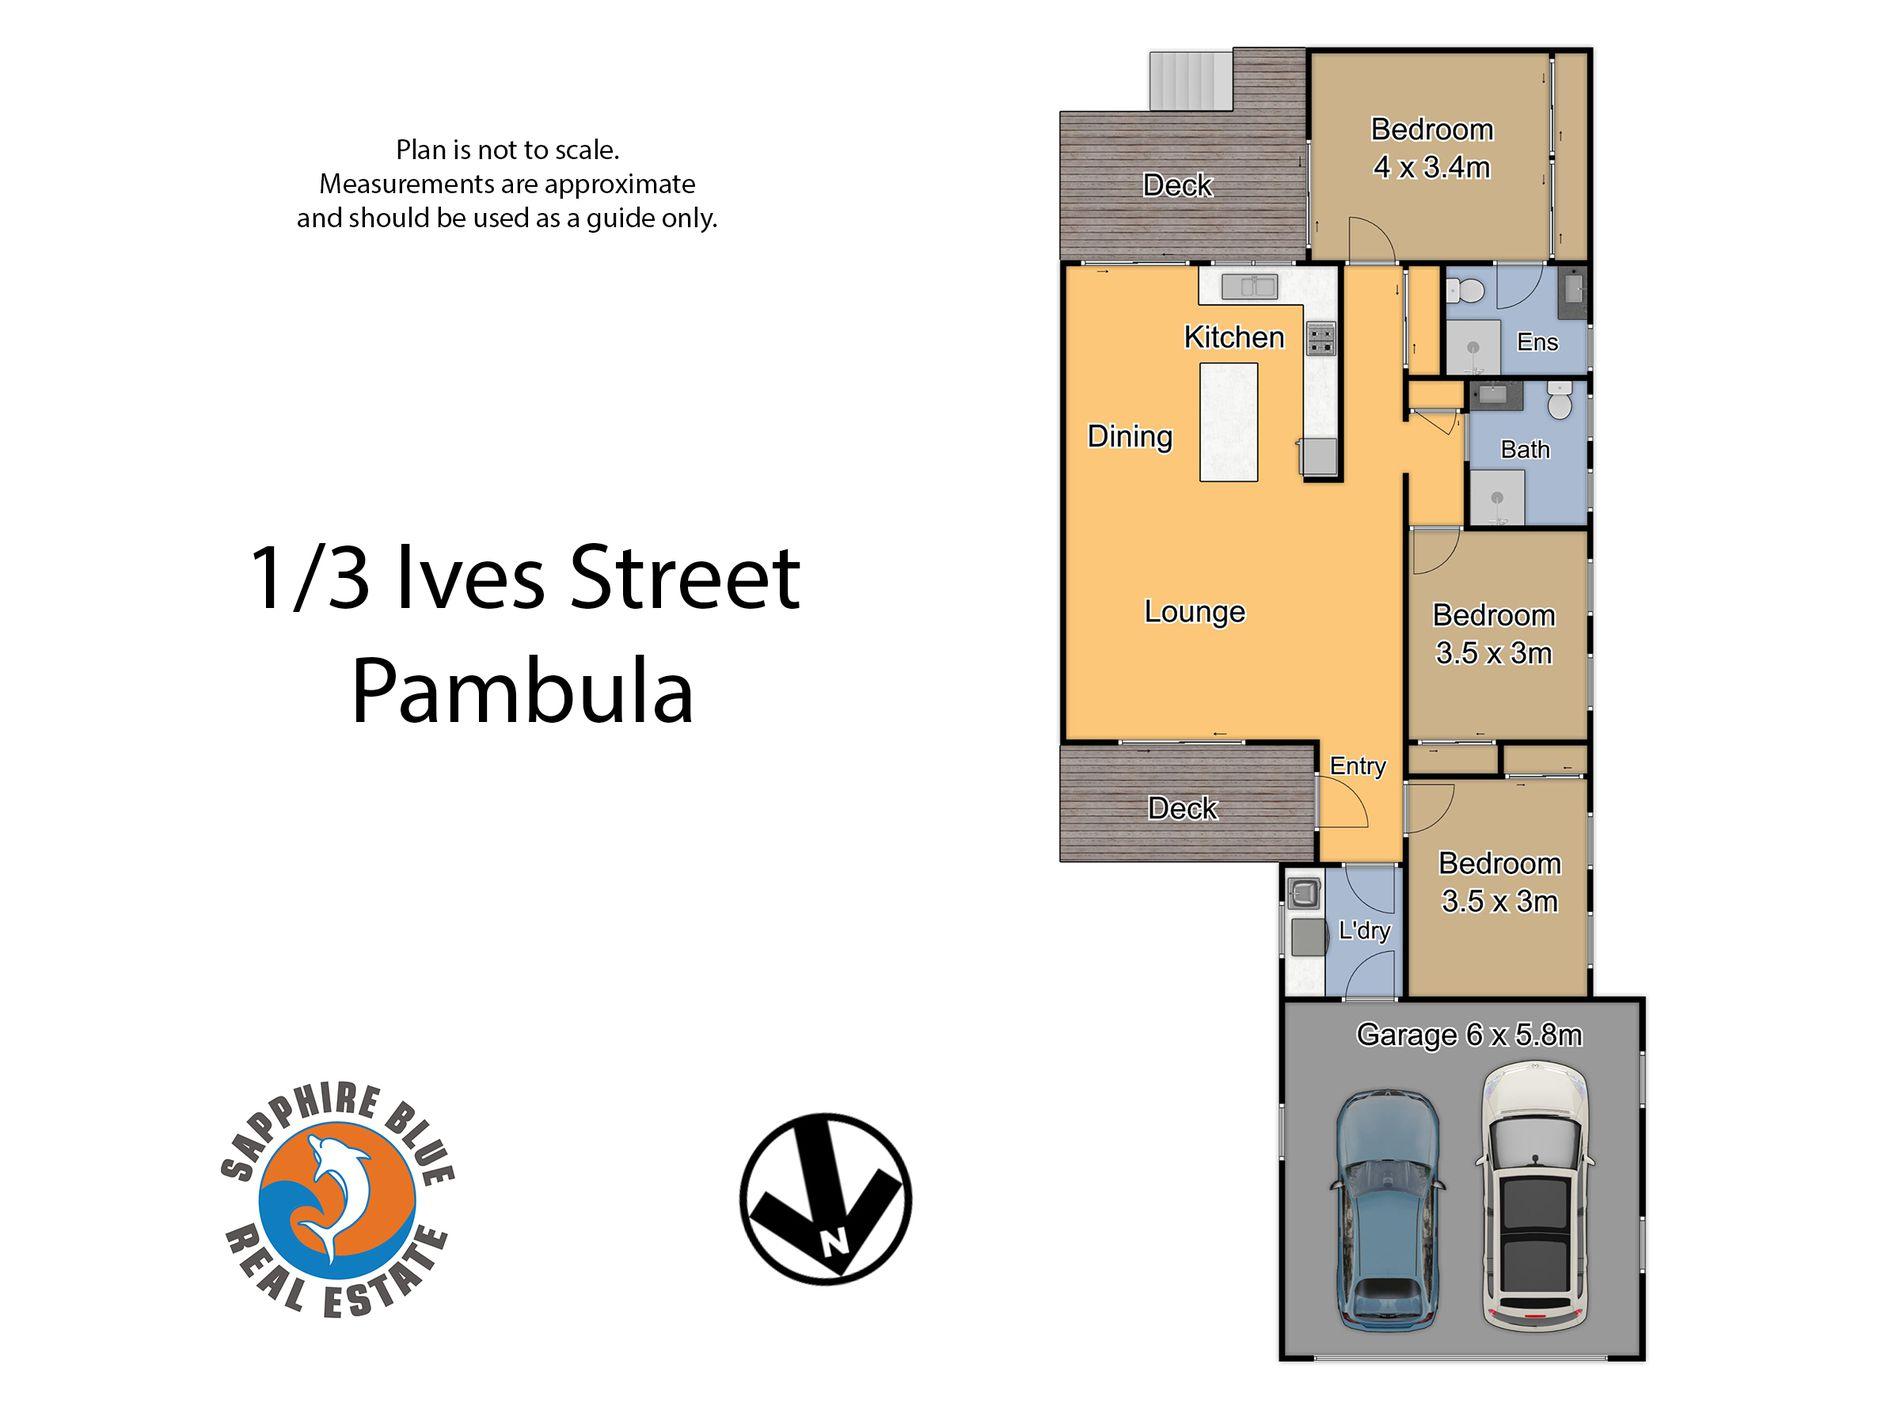 1 / 3 Ives Street, Pambula